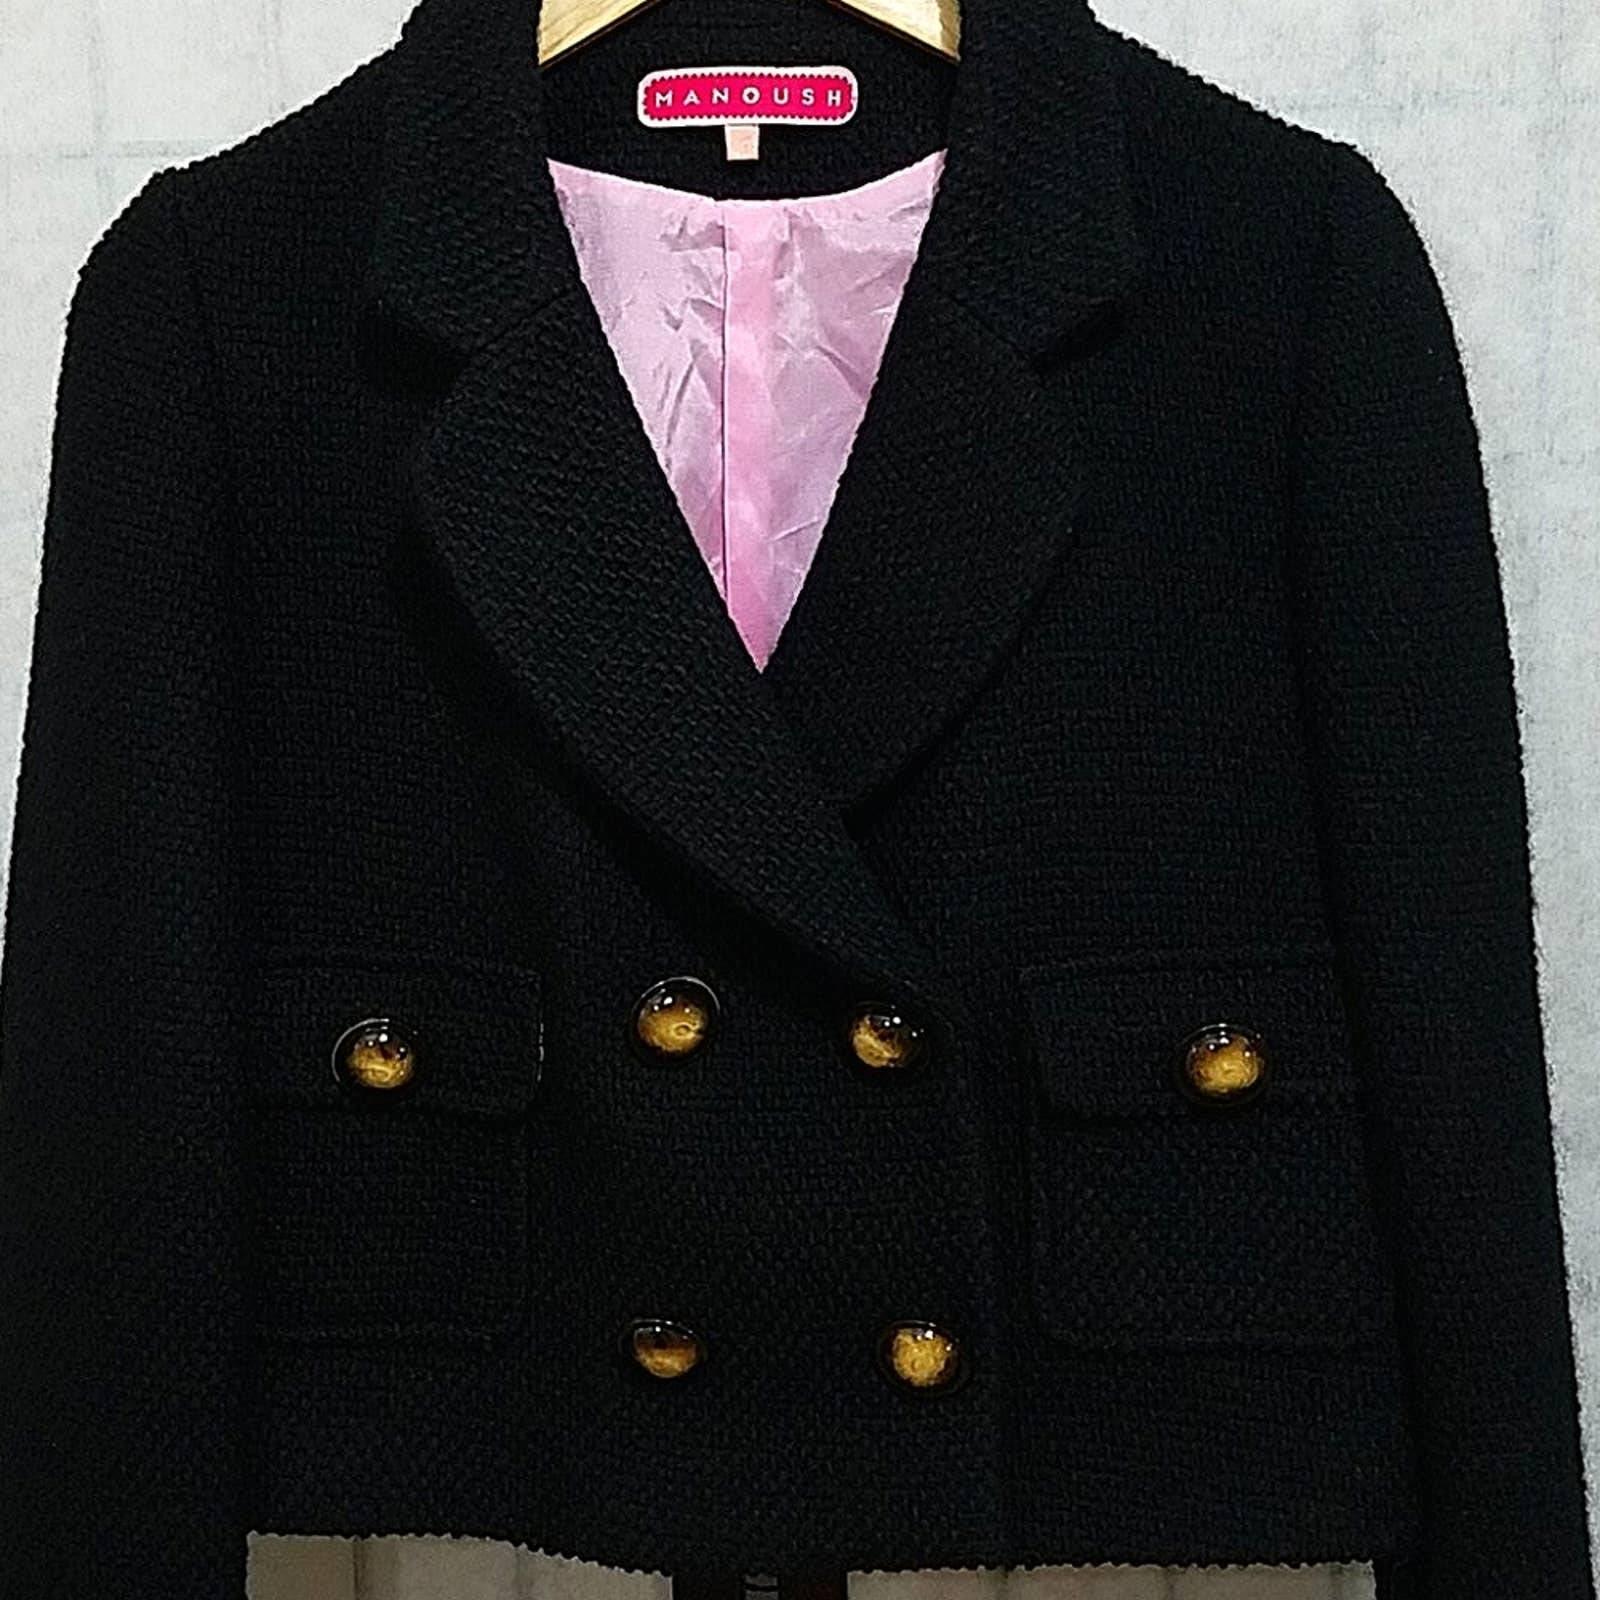 Manoush wool cropped Black jacket 40/6